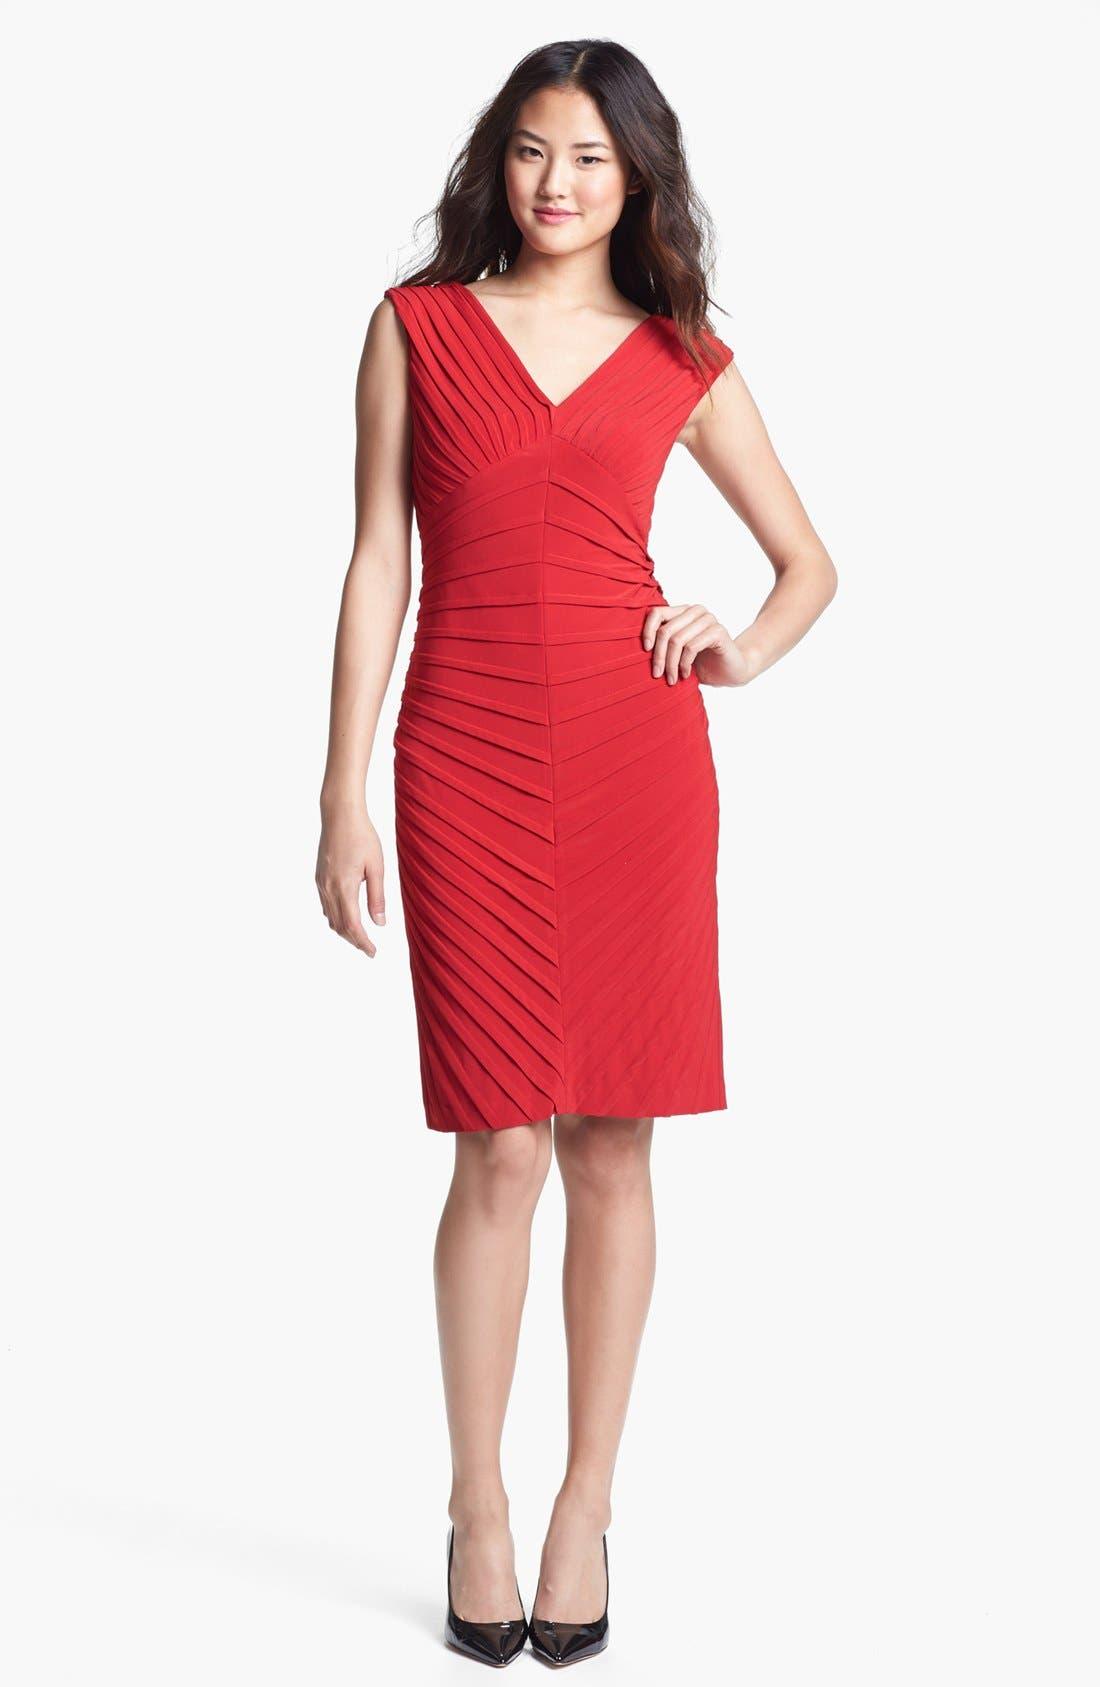 Alternate Image 1 Selected - Adrianna Papell Pintuck Jersey Sheath Dress